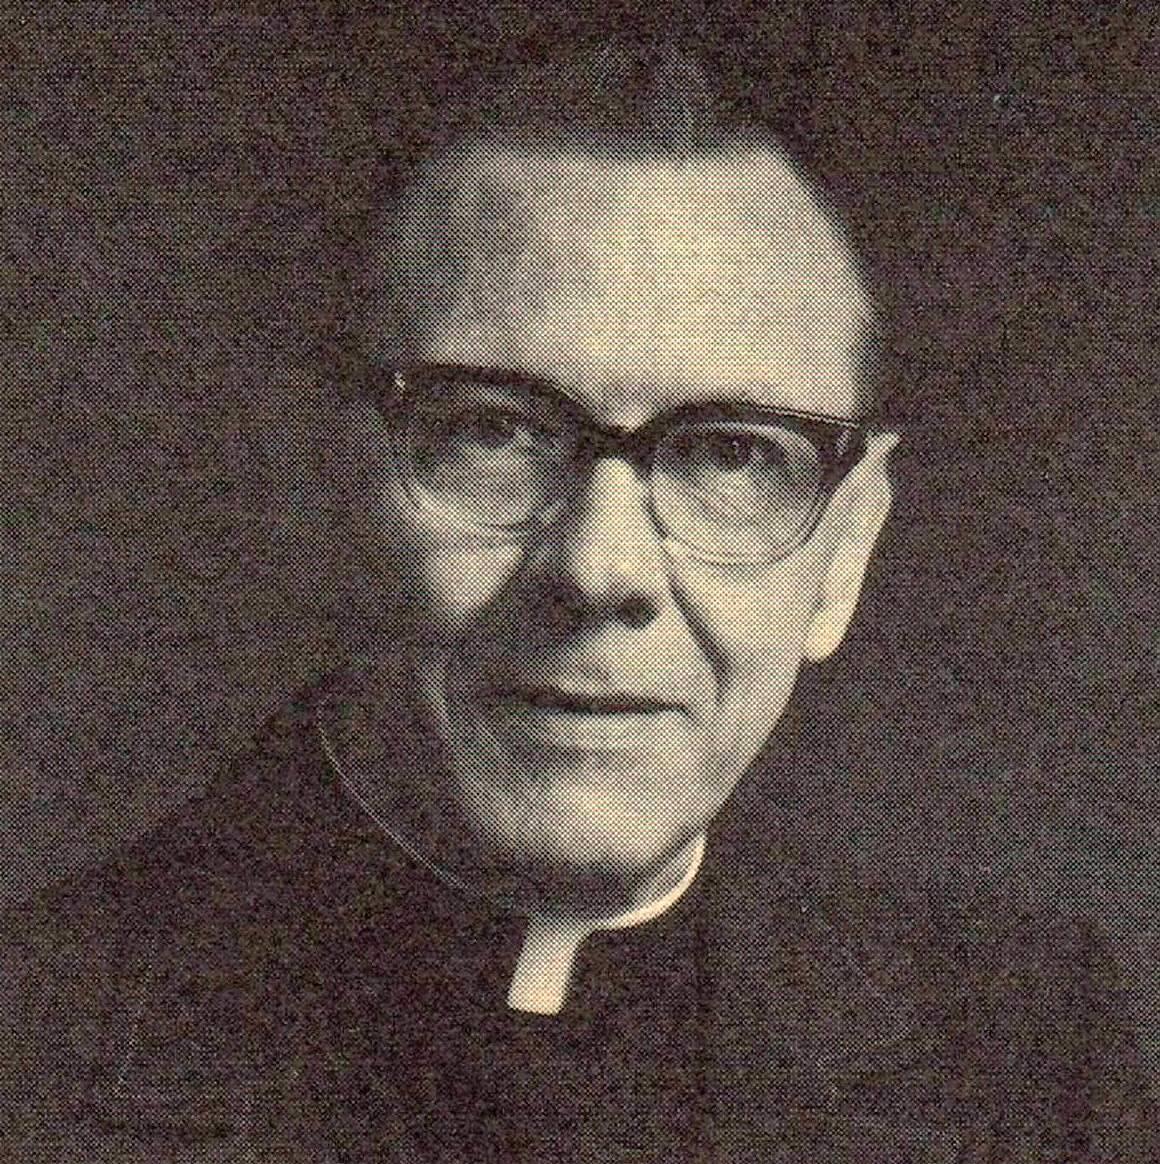 Fr. Edmund Kestel, Assistant at Our Lady of Fatima Parish